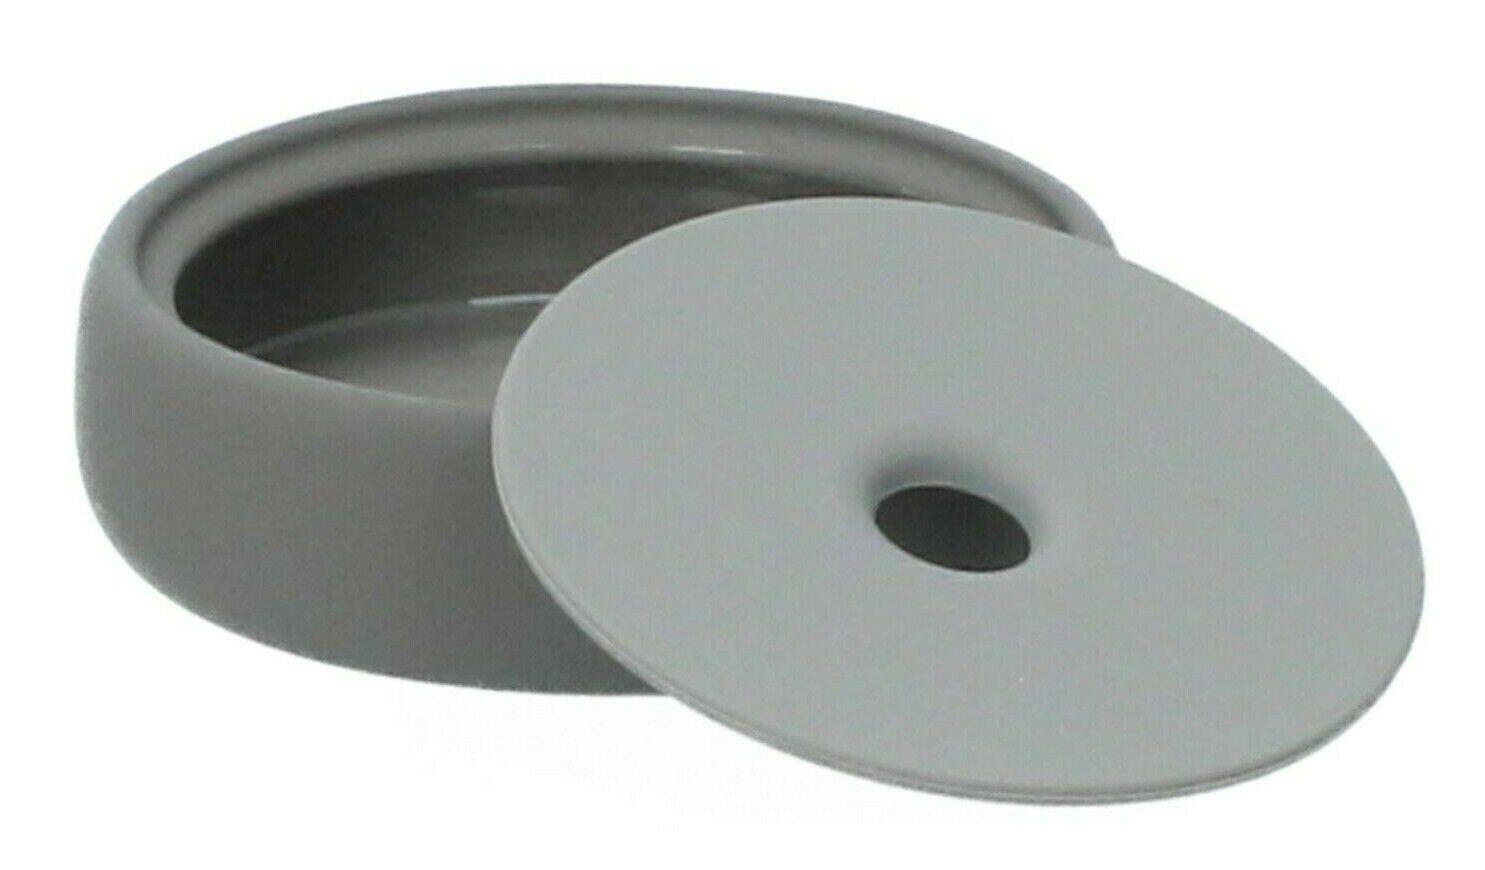 Blomus Magnet Sono Storage Box Soap Dish Ceramic and Silicone Soft Touch Finish